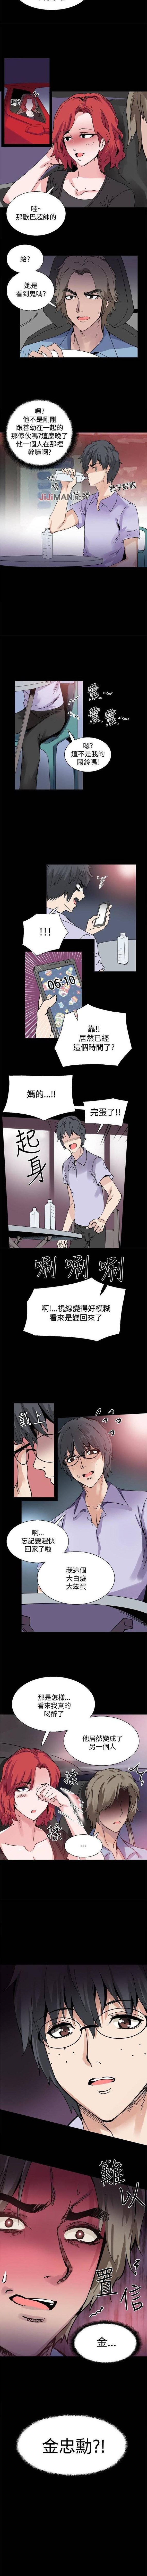 【已完结】Bodychange(作者:Seize & 死亡節奏) 第1~33话 75